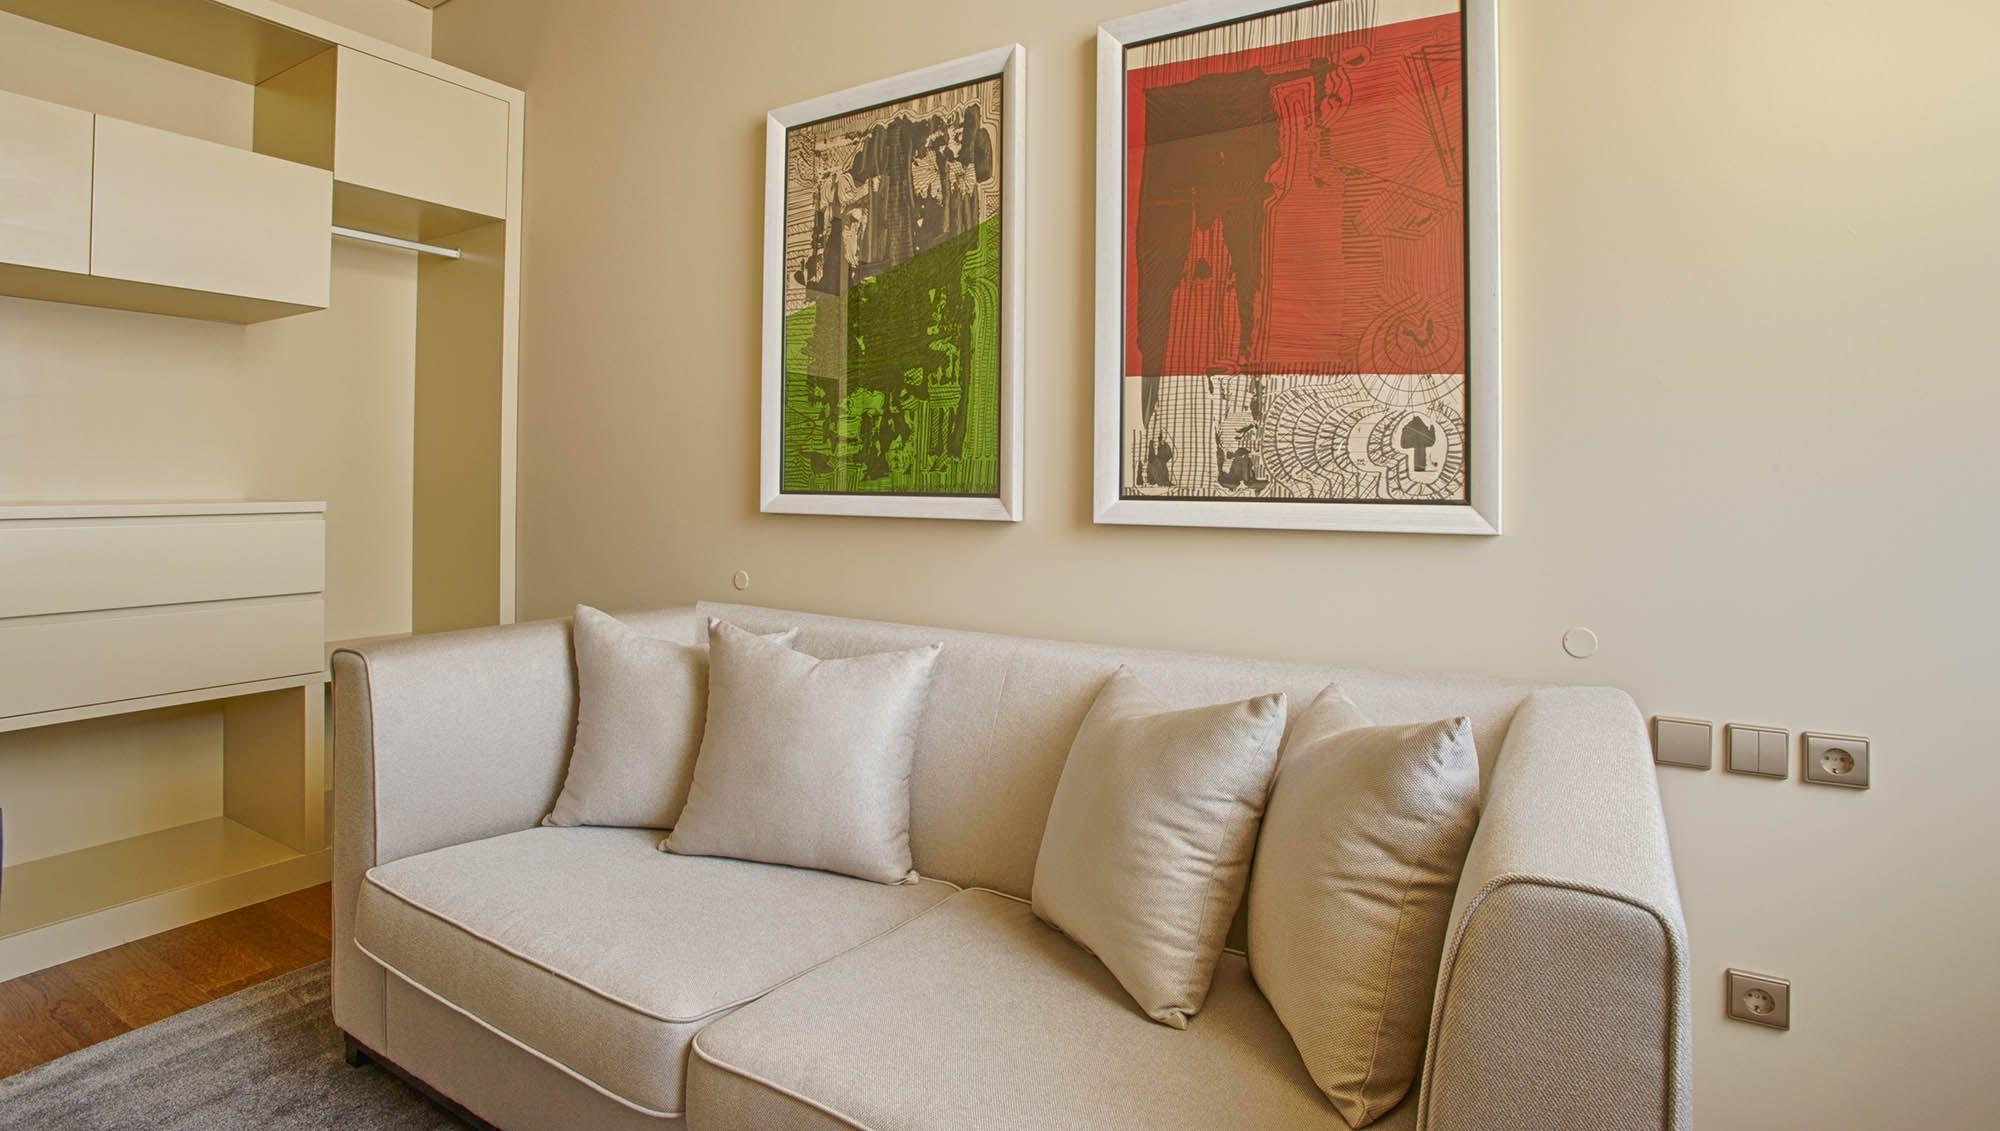 Cais Do Sodr Apartment 2  Laskasas - Decorate Life